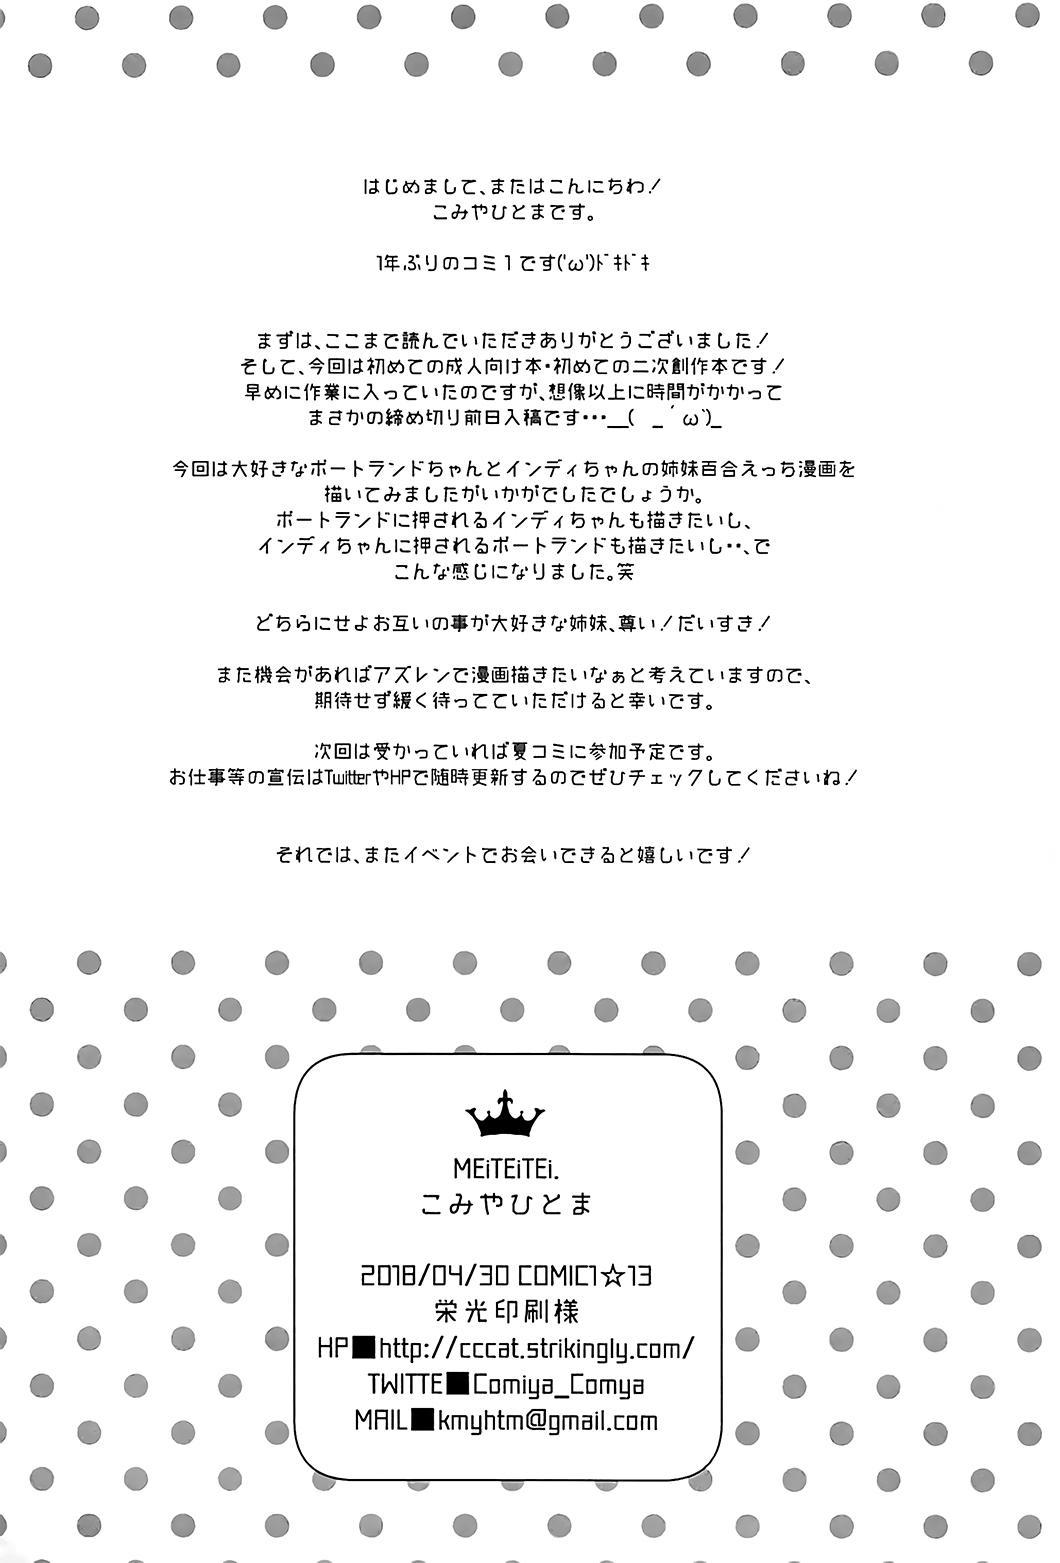 (COMIC1☆13) [MEiTEiTEi. (Komiya Hitoma)] Onee-chan to Issho | Together with Onee-chan (Azur Lane) [English] 22